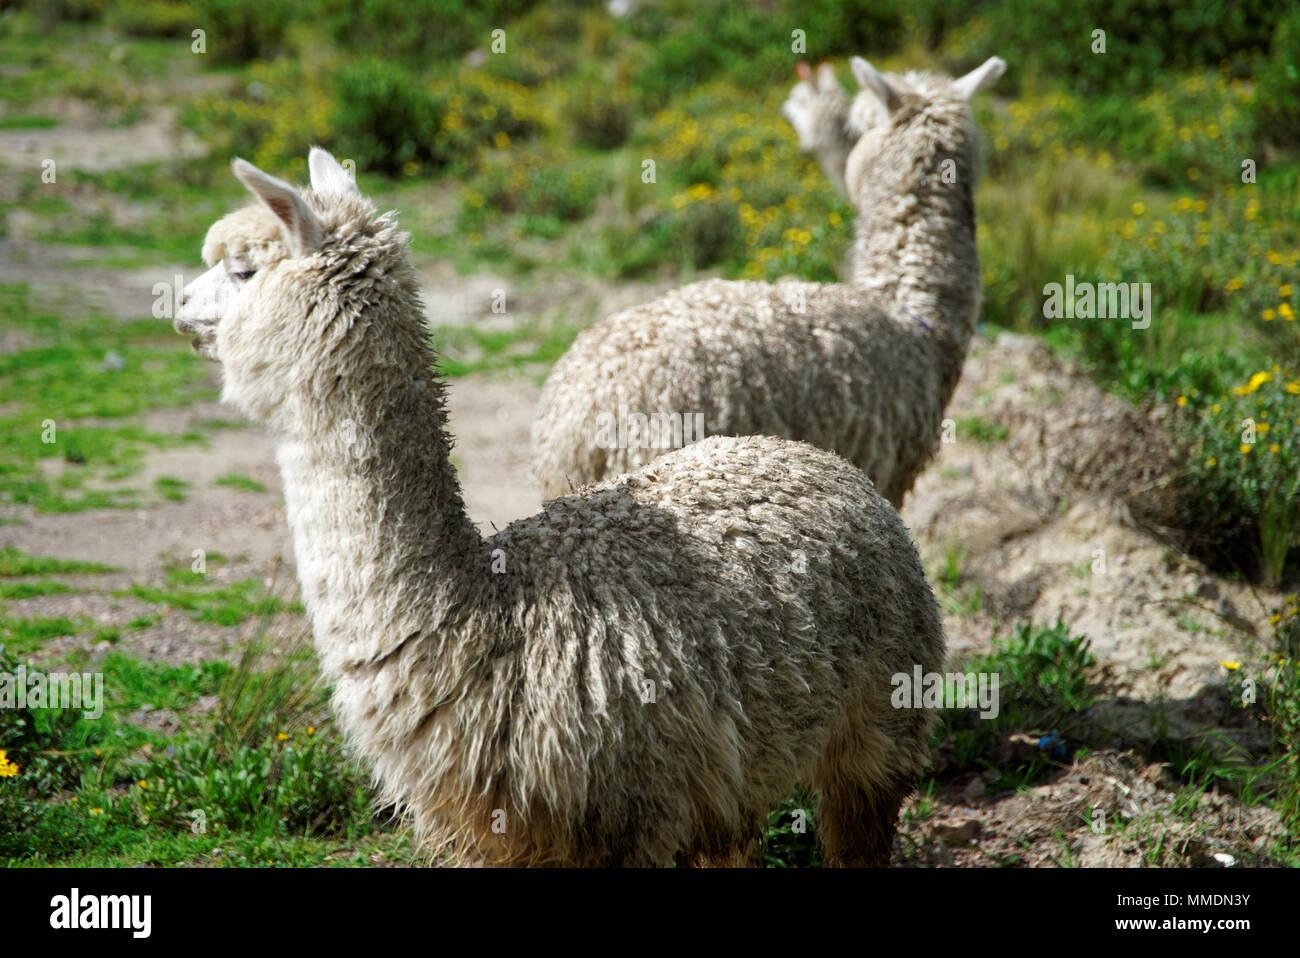 Llamas in the Arequipa Region - Stock Image